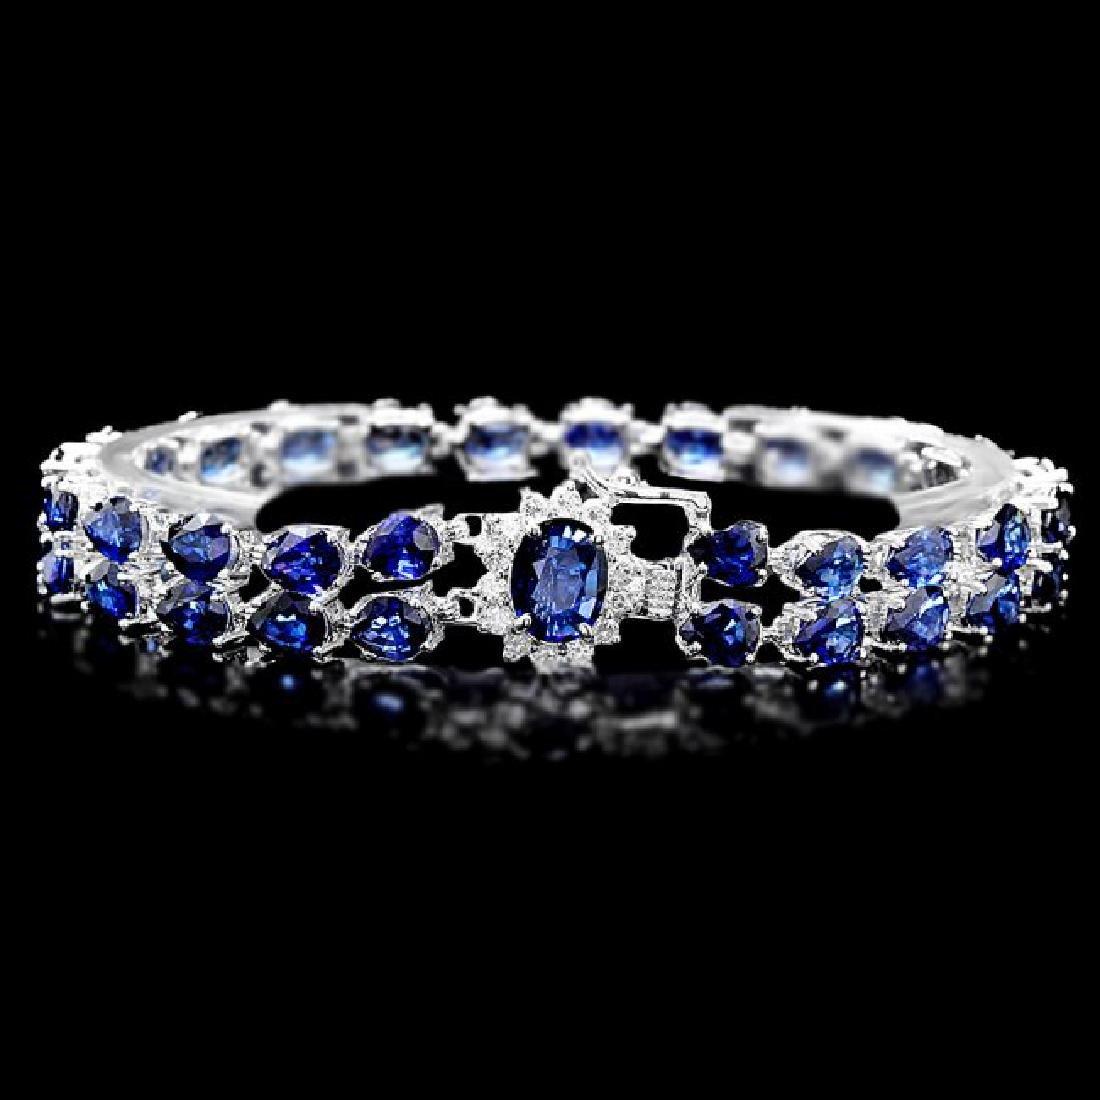 14k Gold 26ct Sapphire 0.60ct Diamond Bracelet